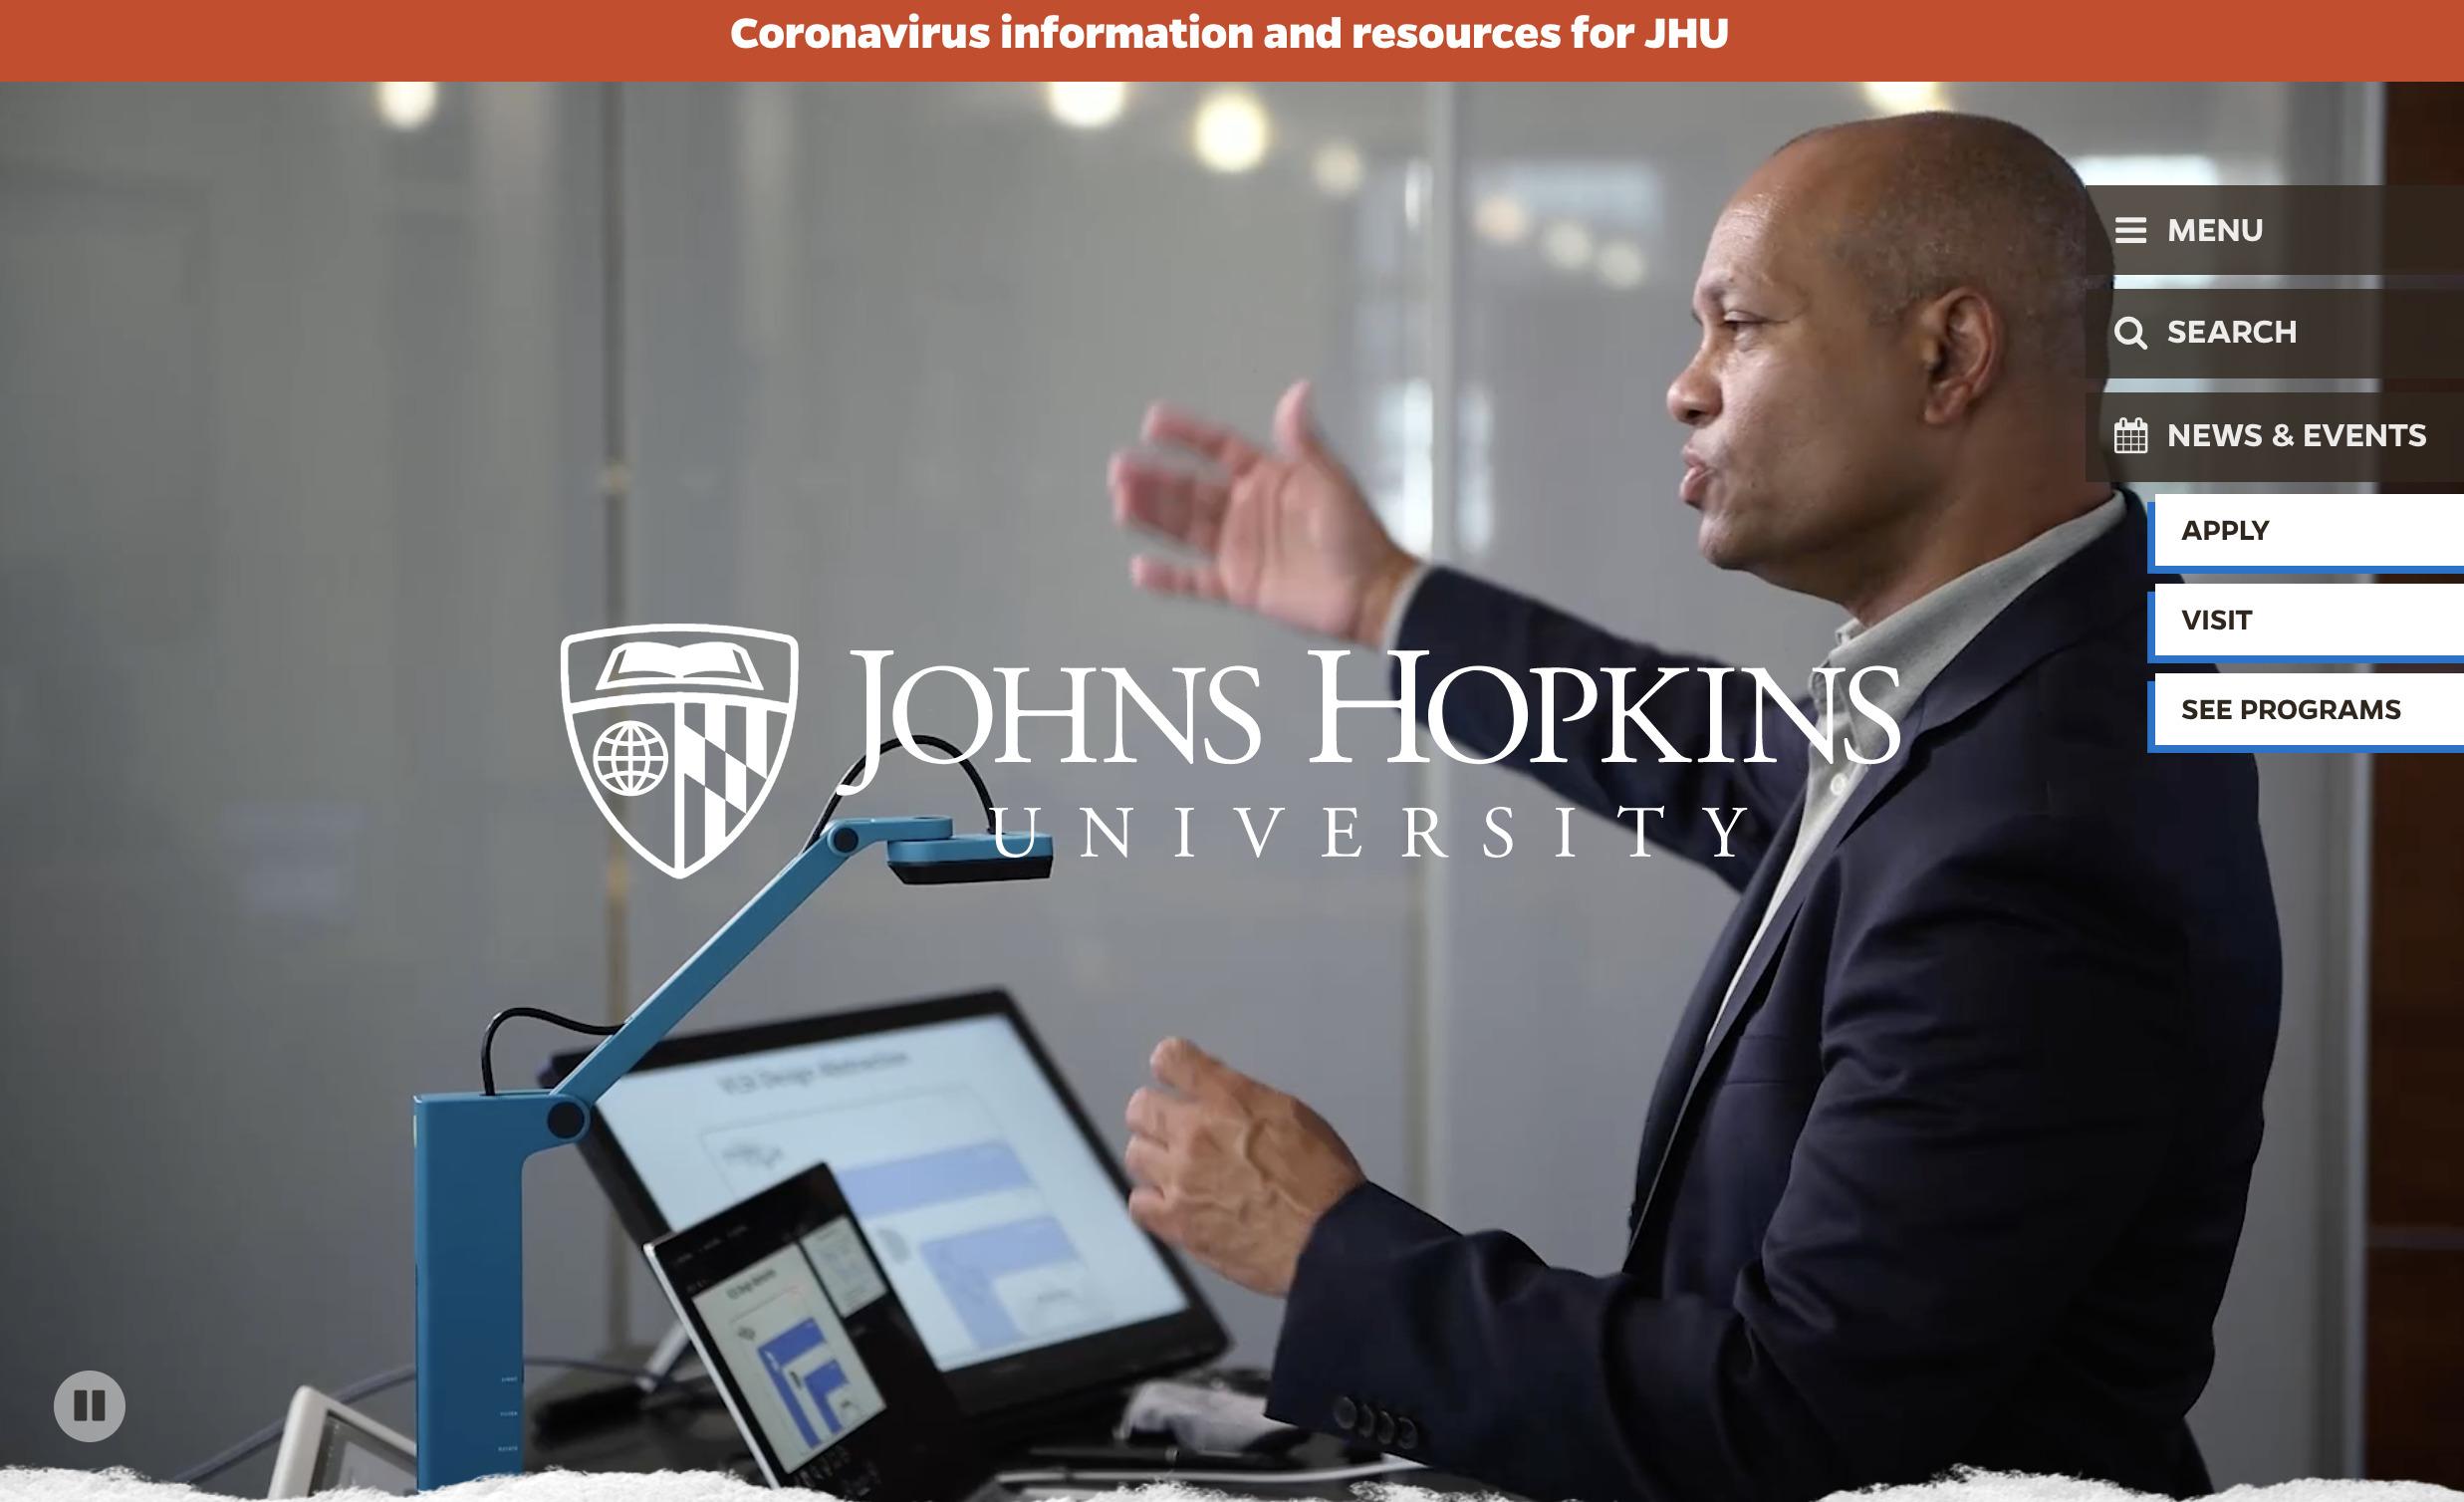 John Hopkins University Homepage